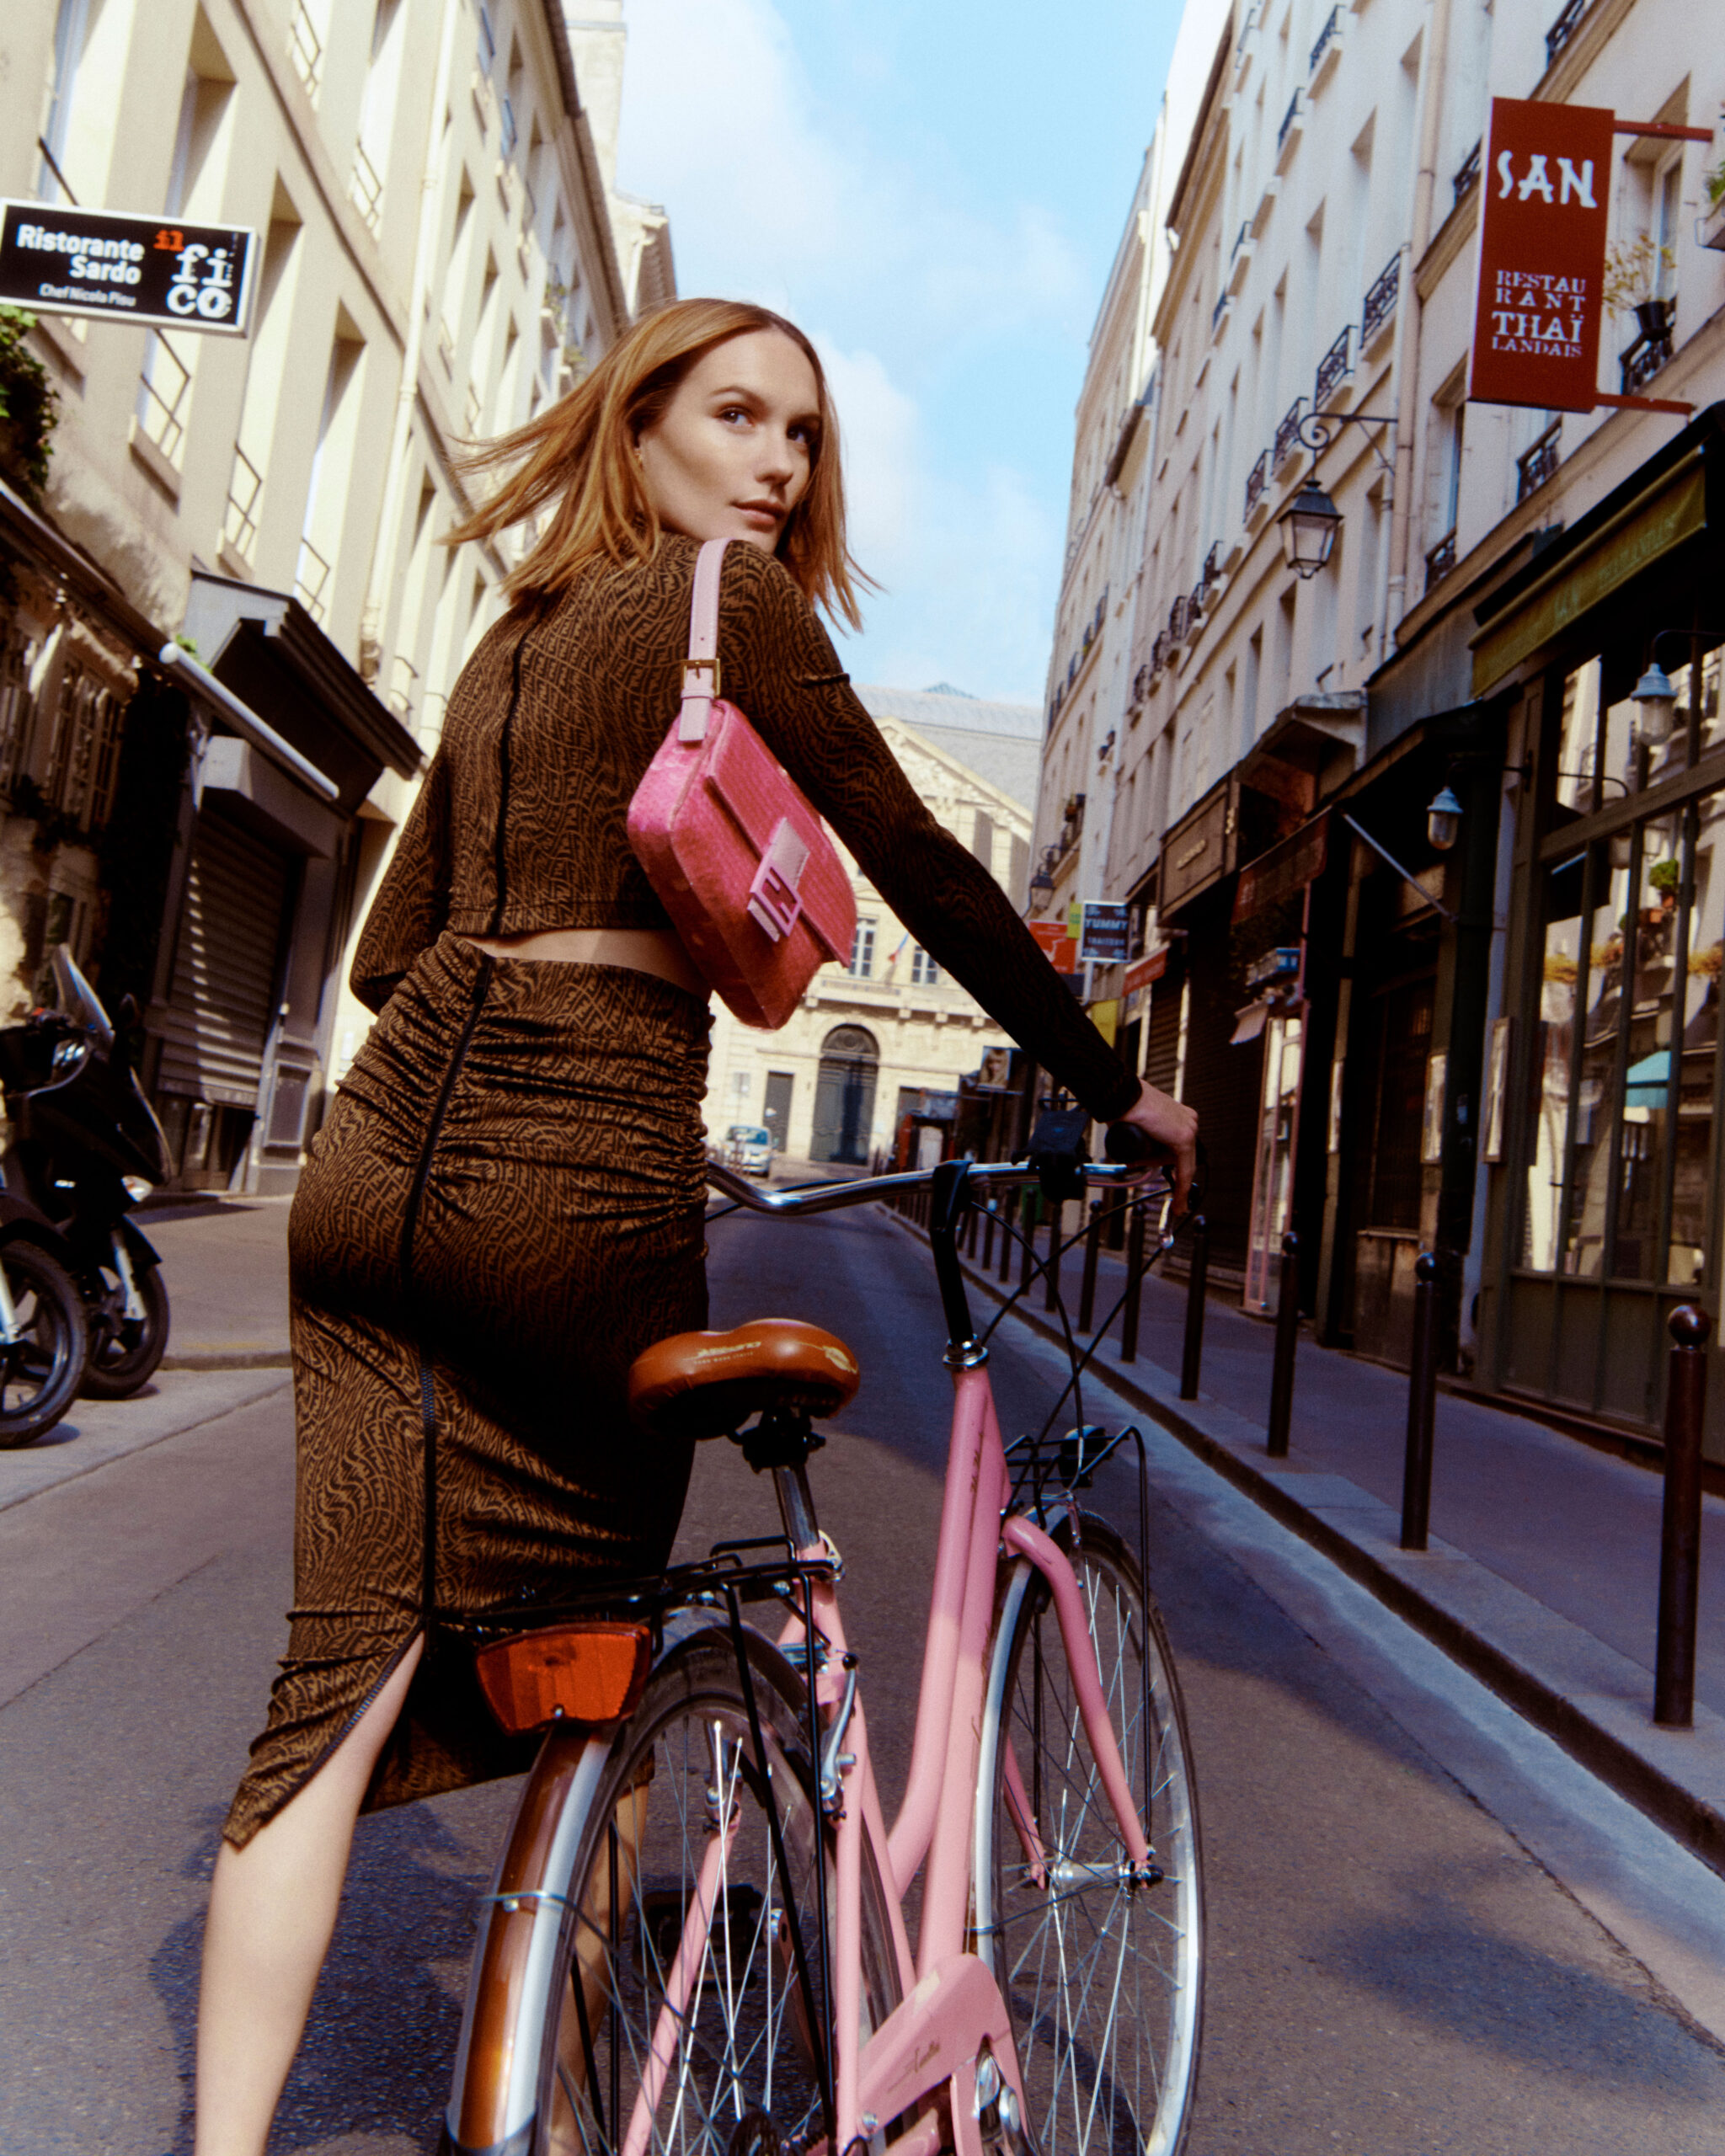 03 FENDI Baguette 1997 The Baguette Walk